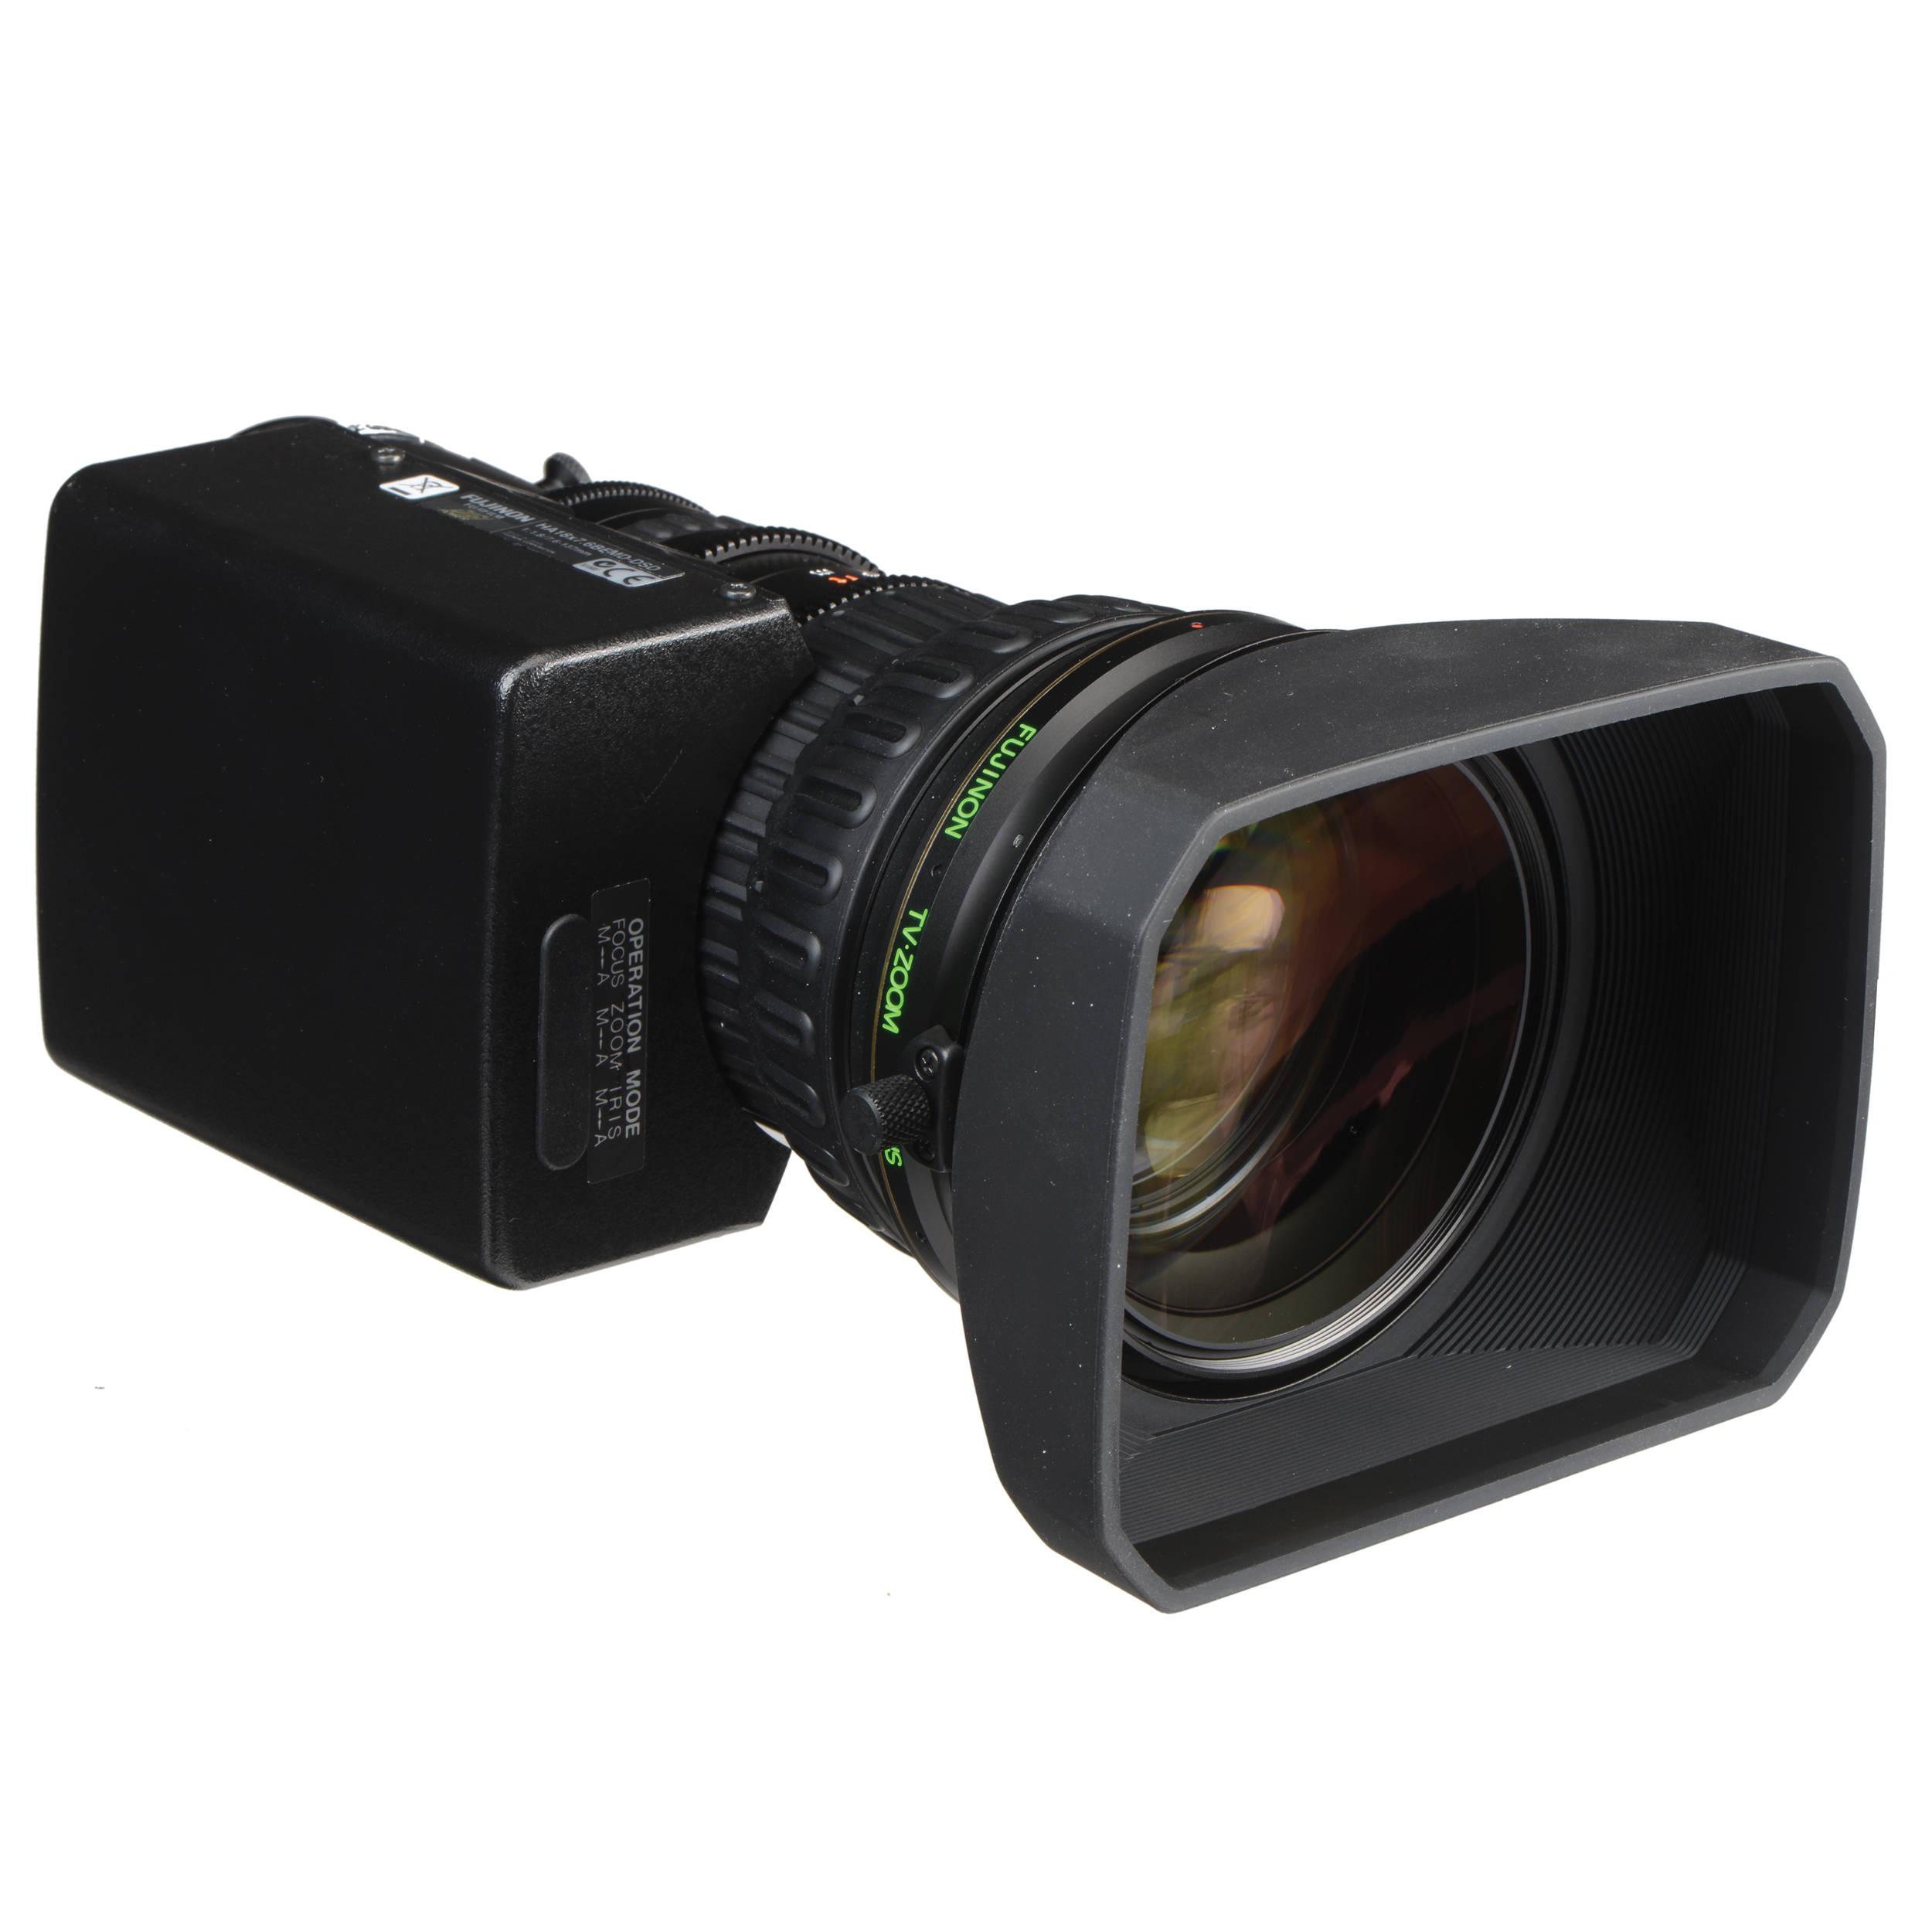 Fujinon 2 3 Hd Eng Full Servo Lens Ha18x76bemd Dse Bh Circuithelp Arduino Micro With 18x Optical Zoom